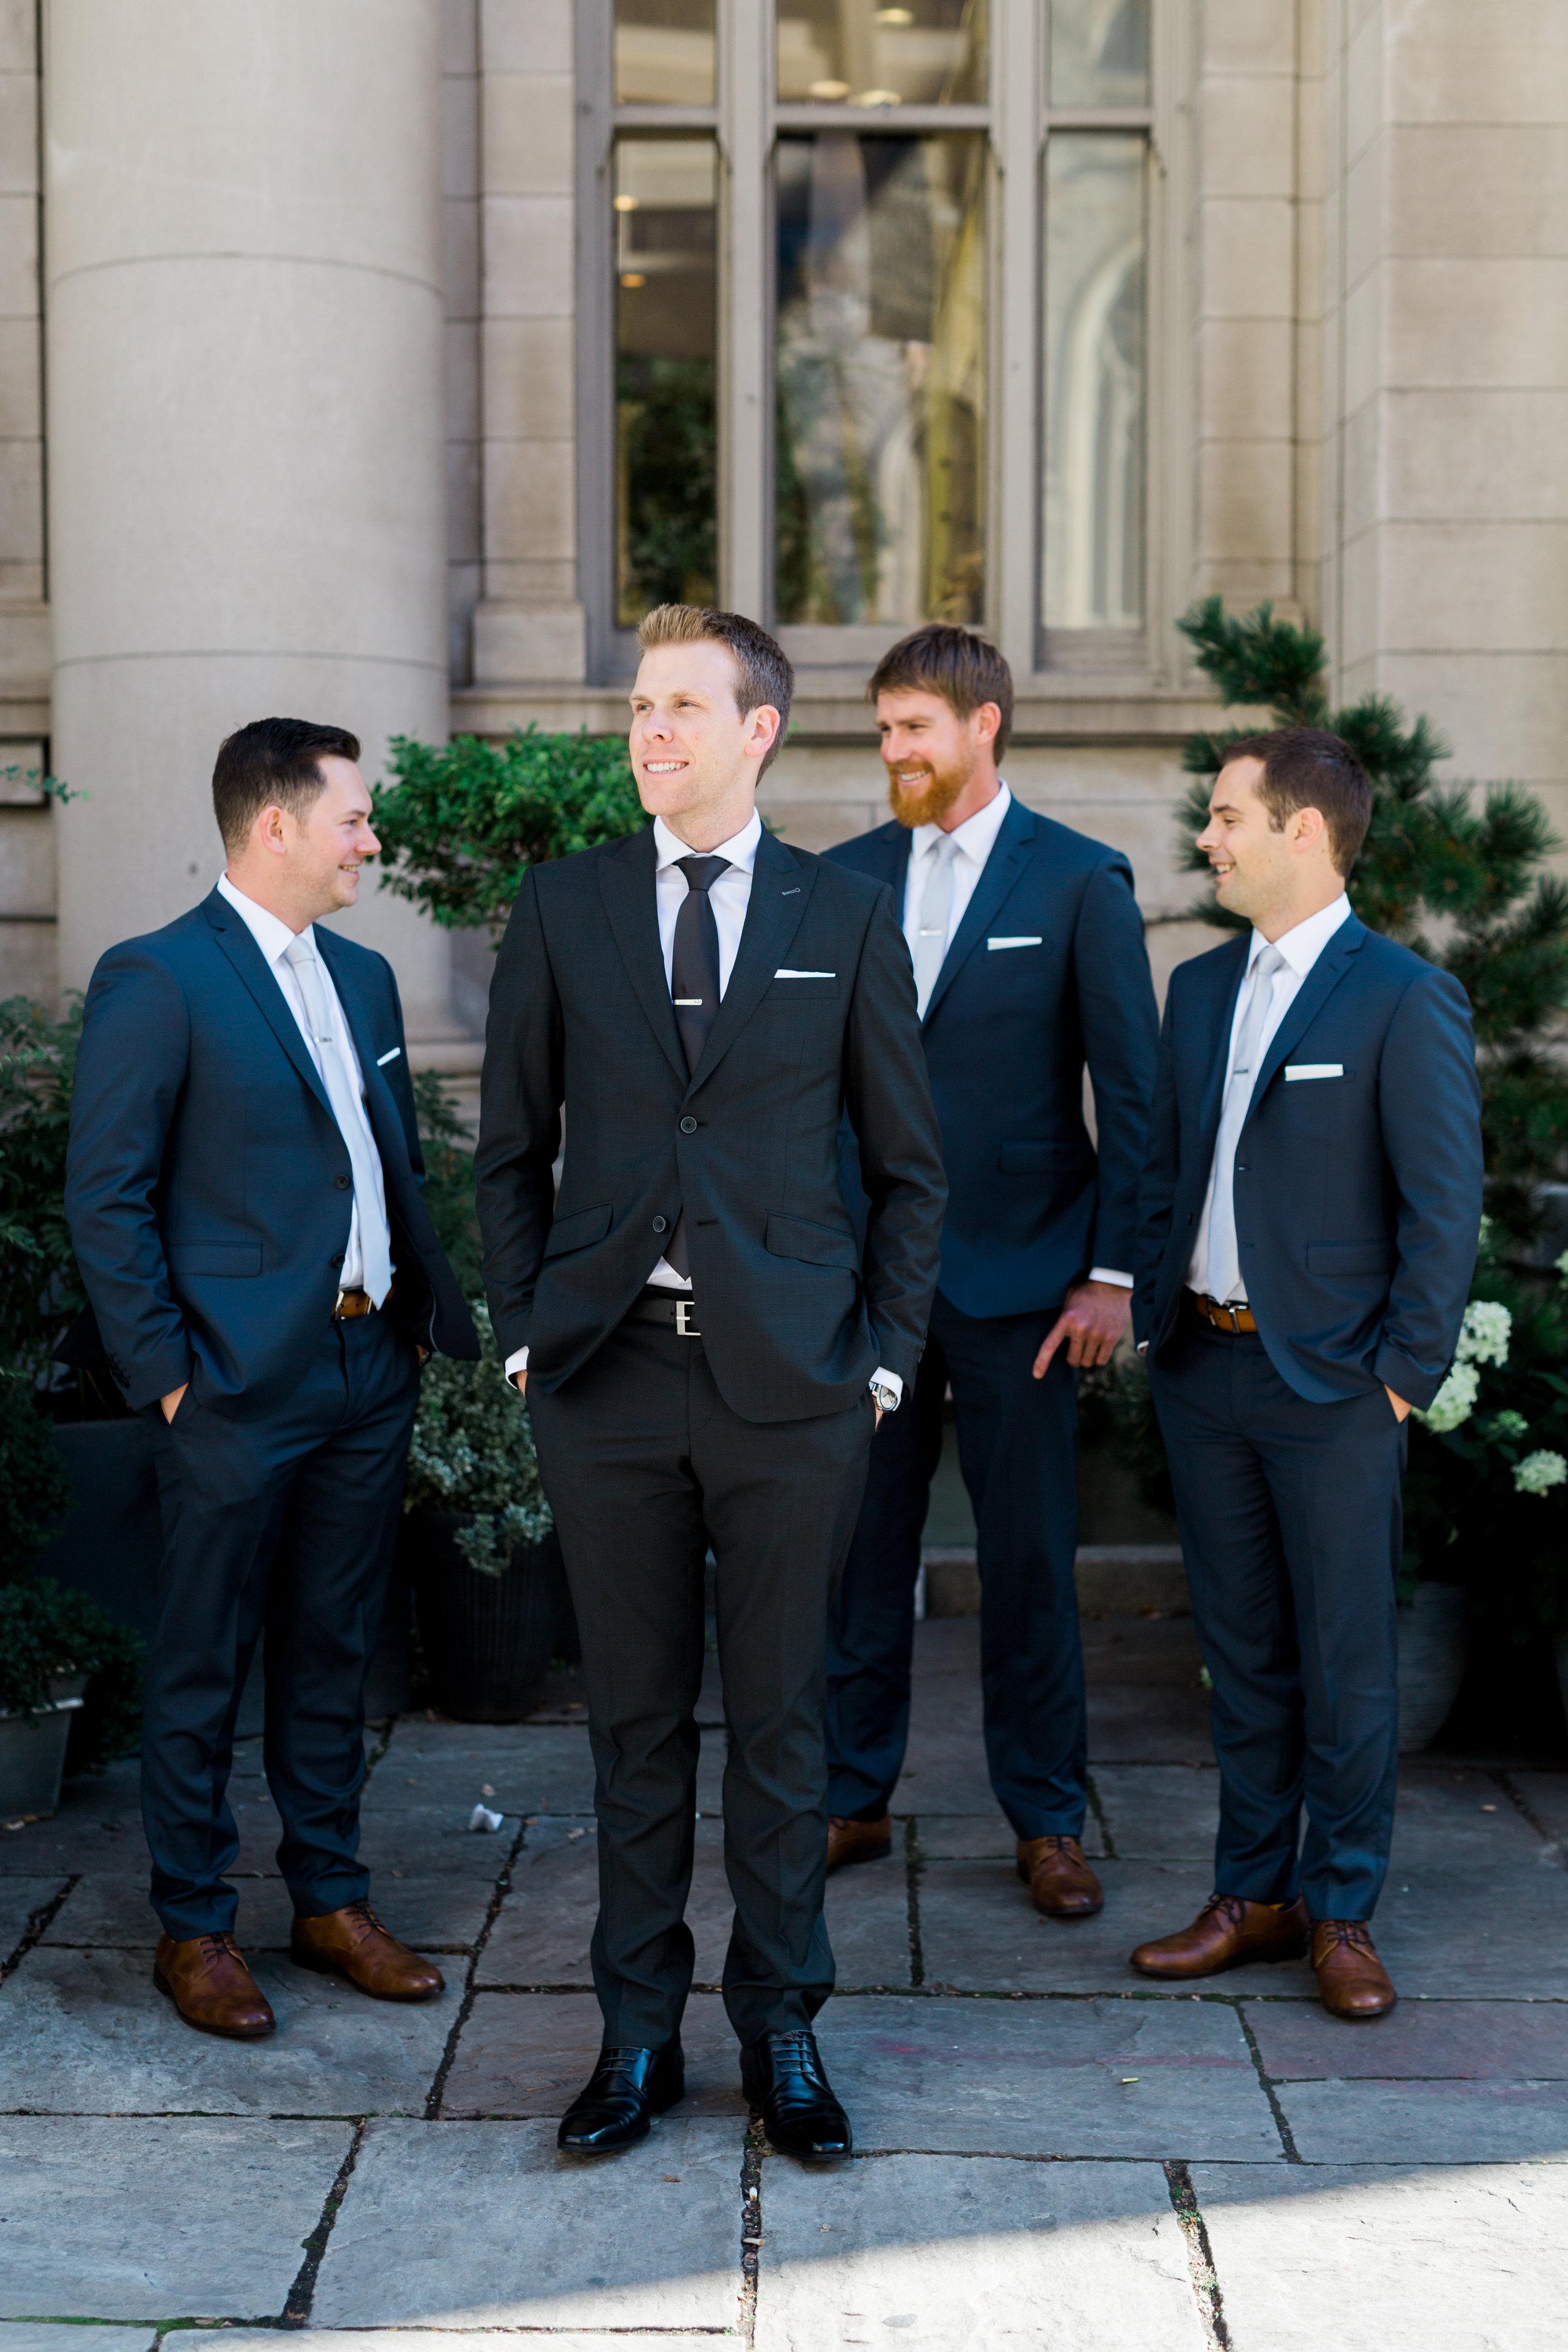 Toronto Fine Art Photographer - Yorkville Wedding - Bridal Party Portraits-27.jpg